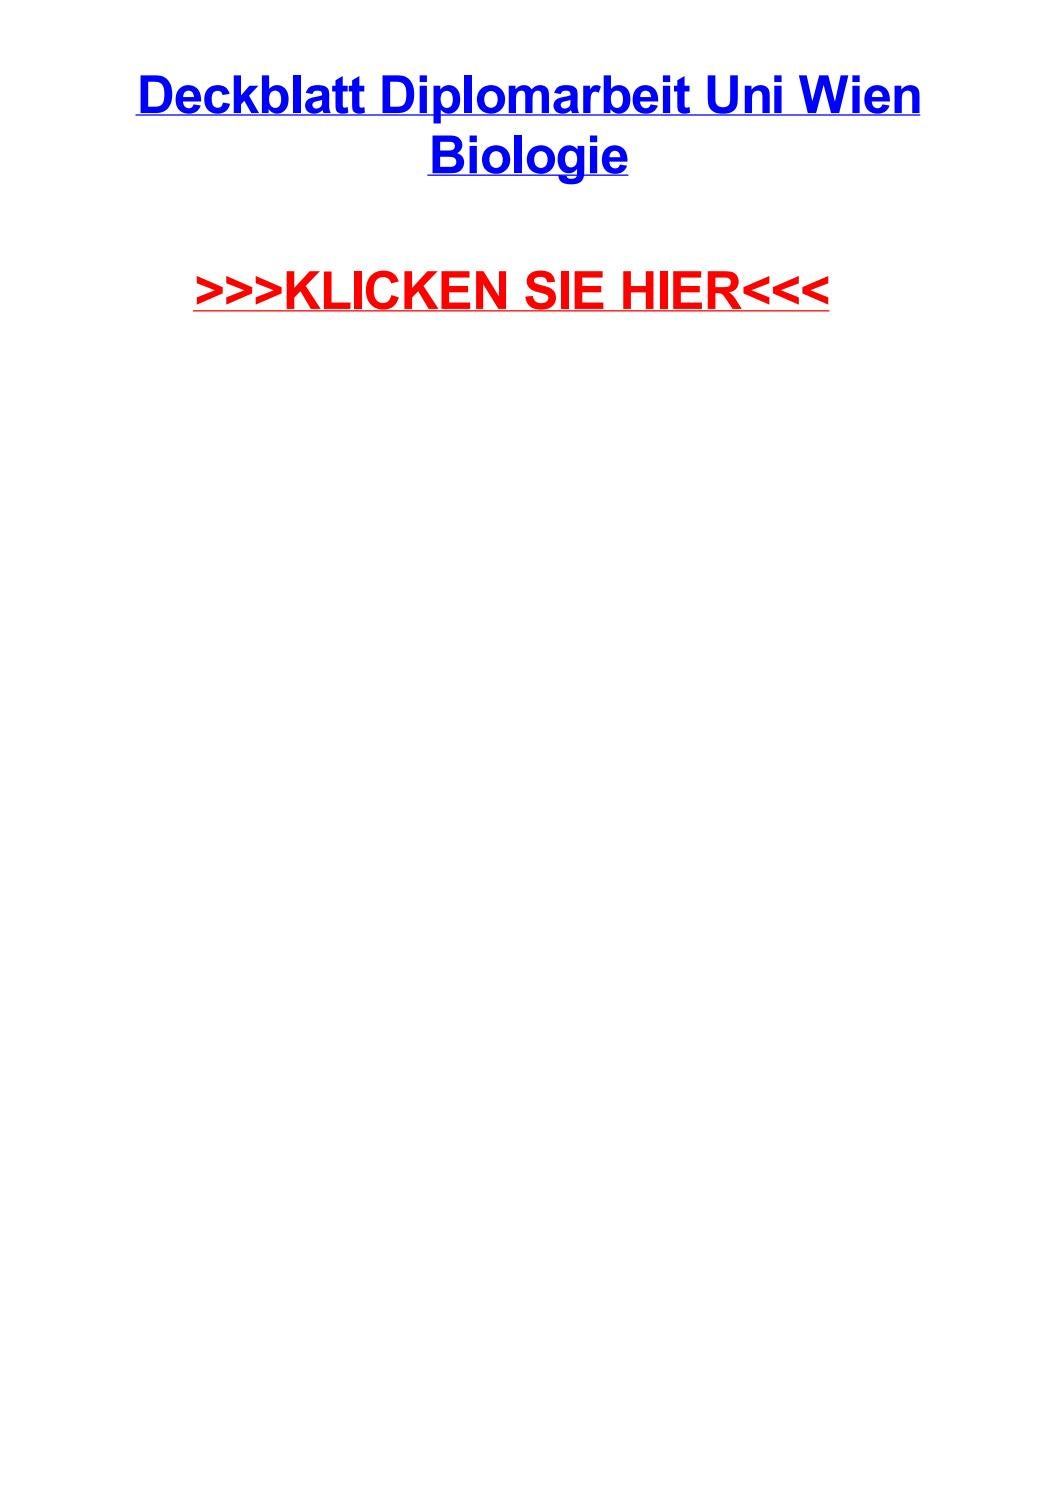 Deckblatt diplomarbeit uni wien biologie by brinsonrxrm - issuu